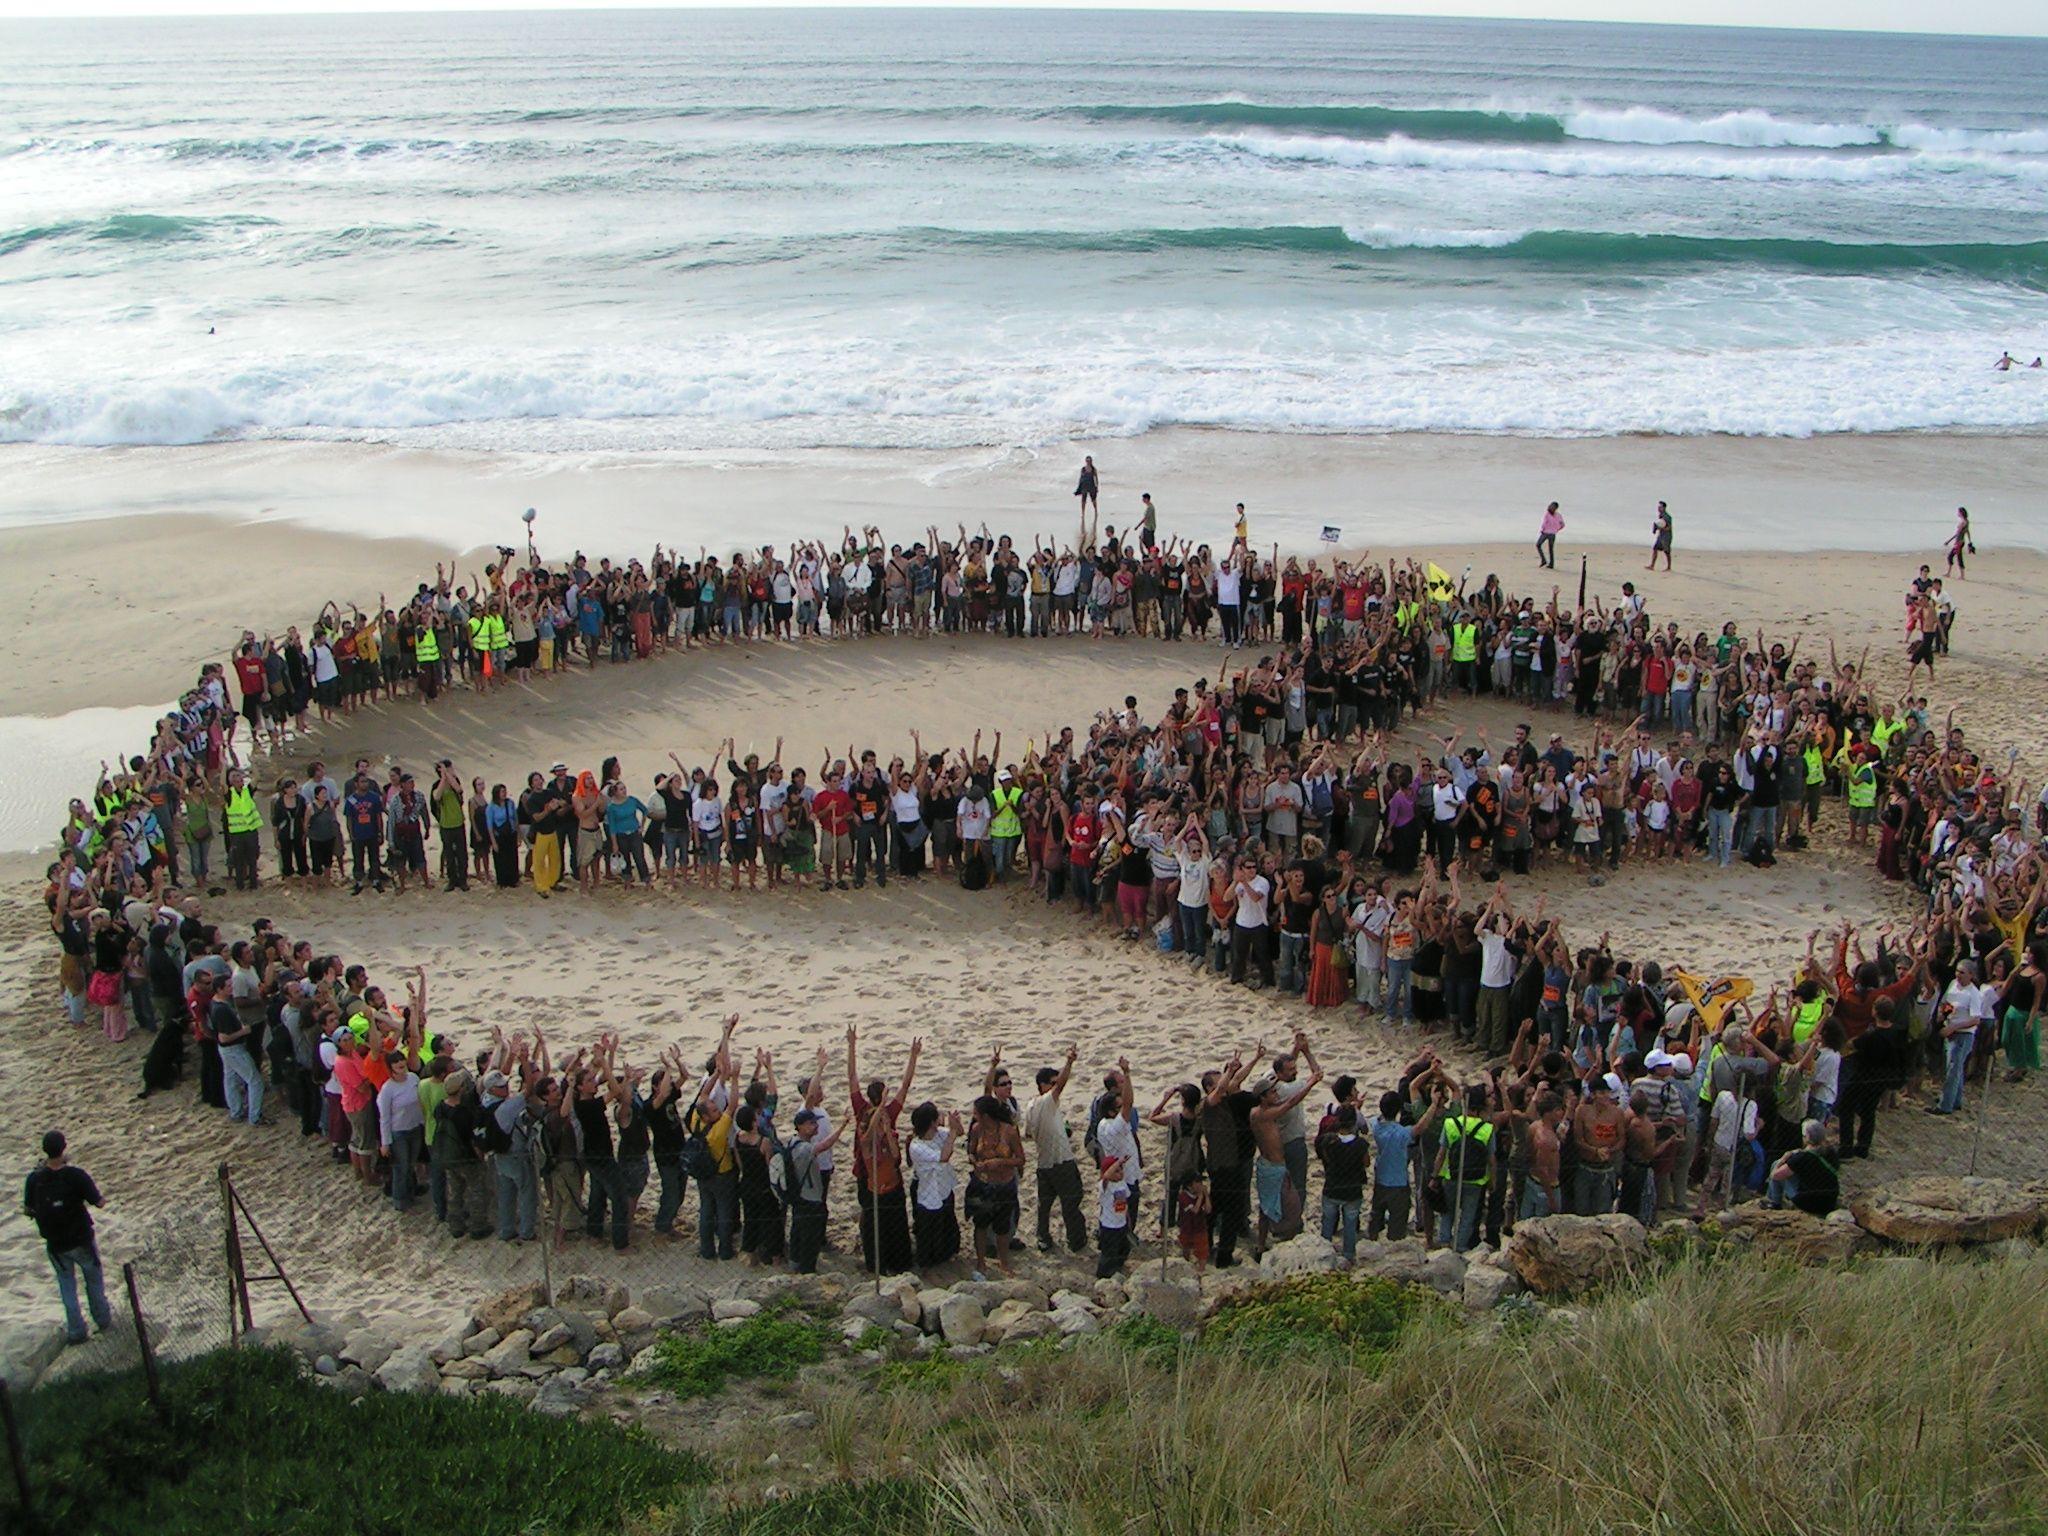 Paz en la playa